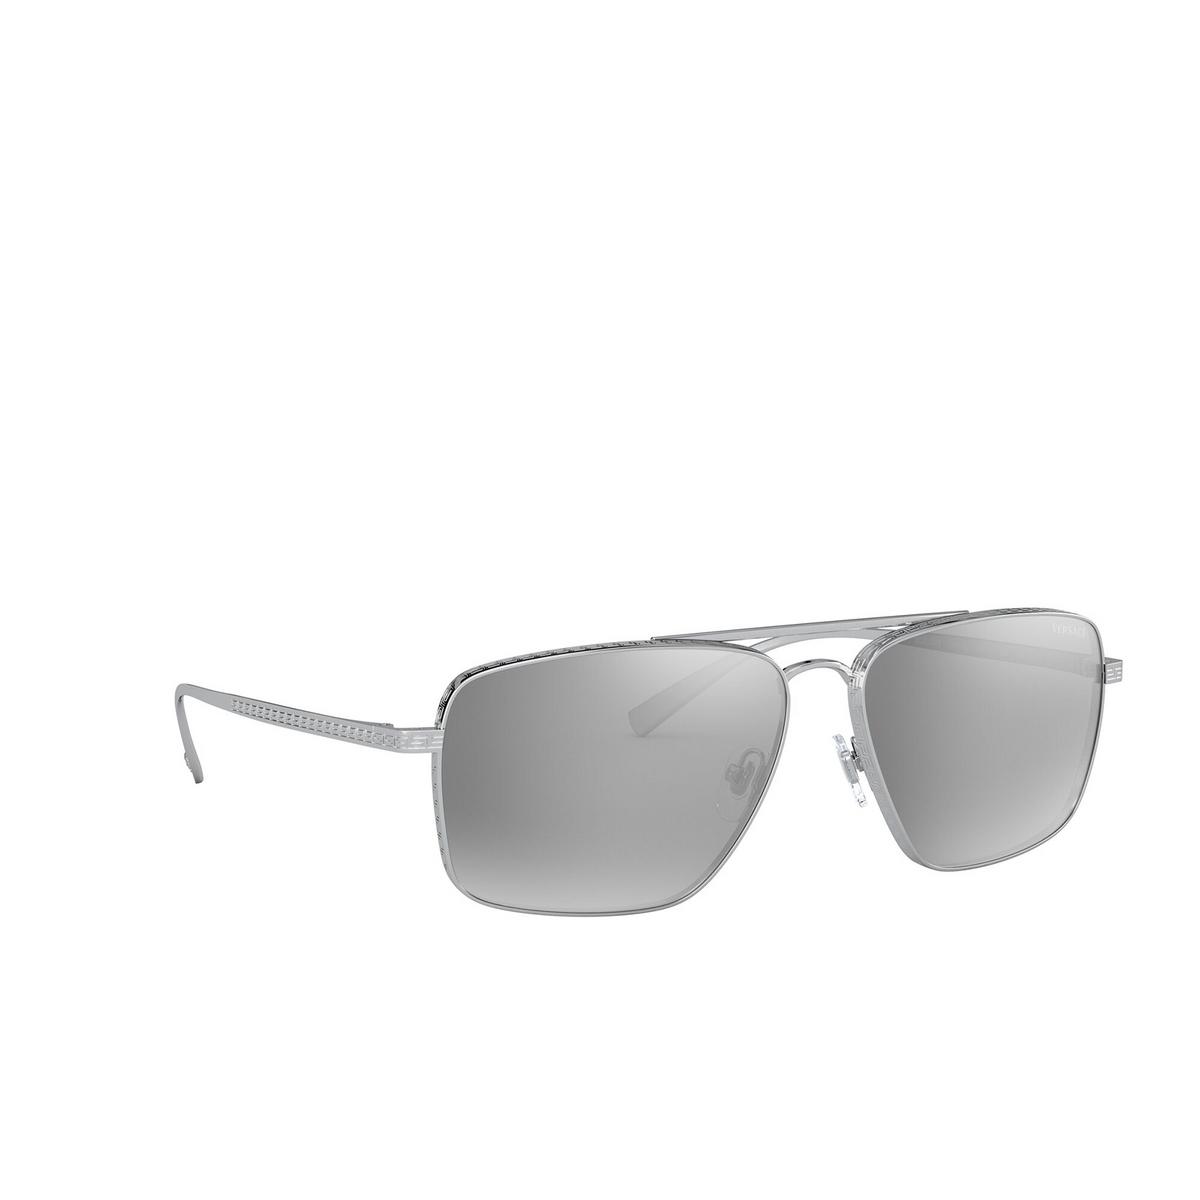 Versace® Square Sunglasses: VE2216 color Silver 10006G - three-quarters view.